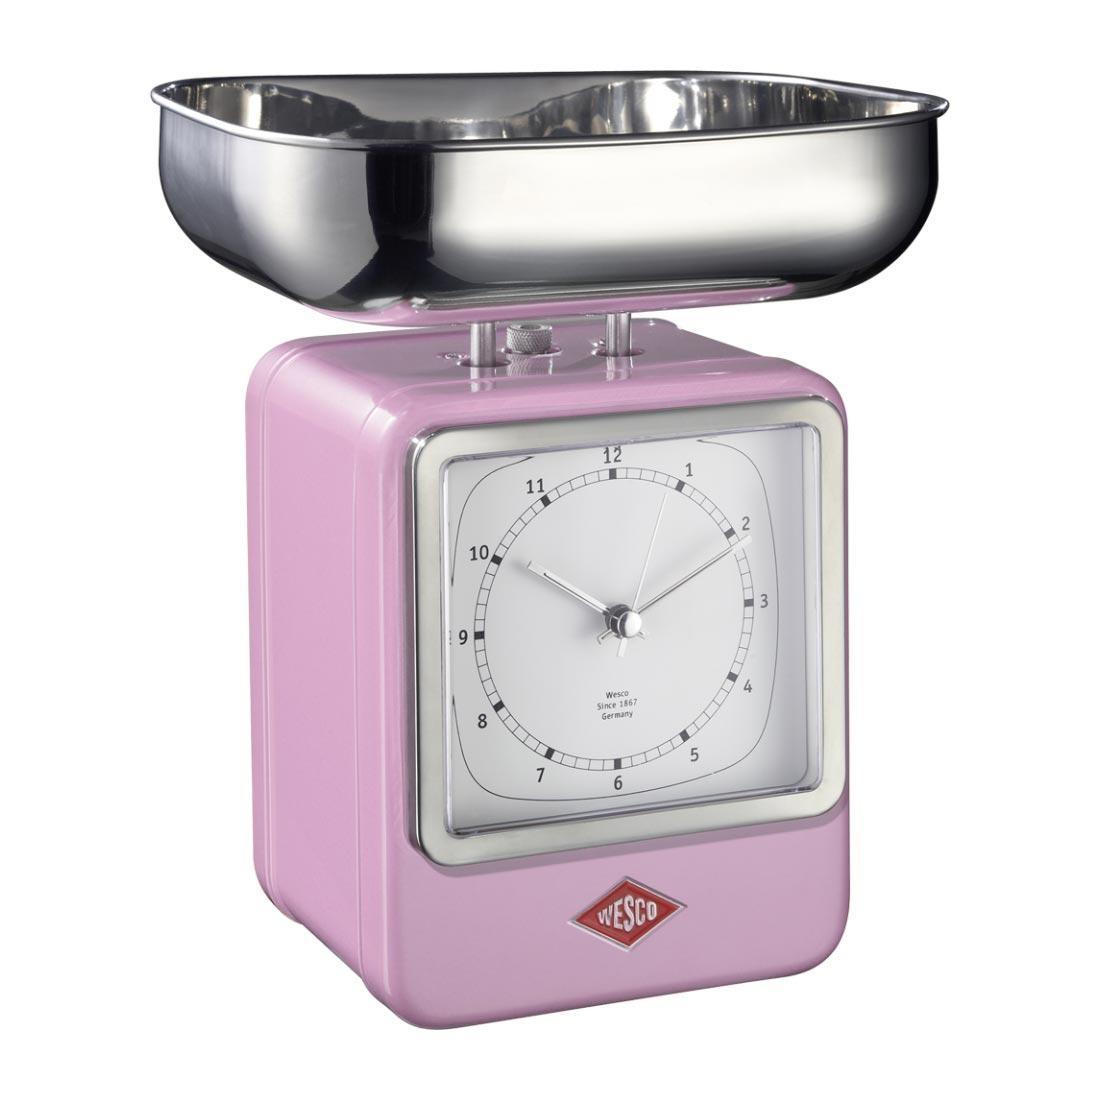 Wesco retro balance avec horloge rose fonc 15x27x13cm for Cuisine wesco